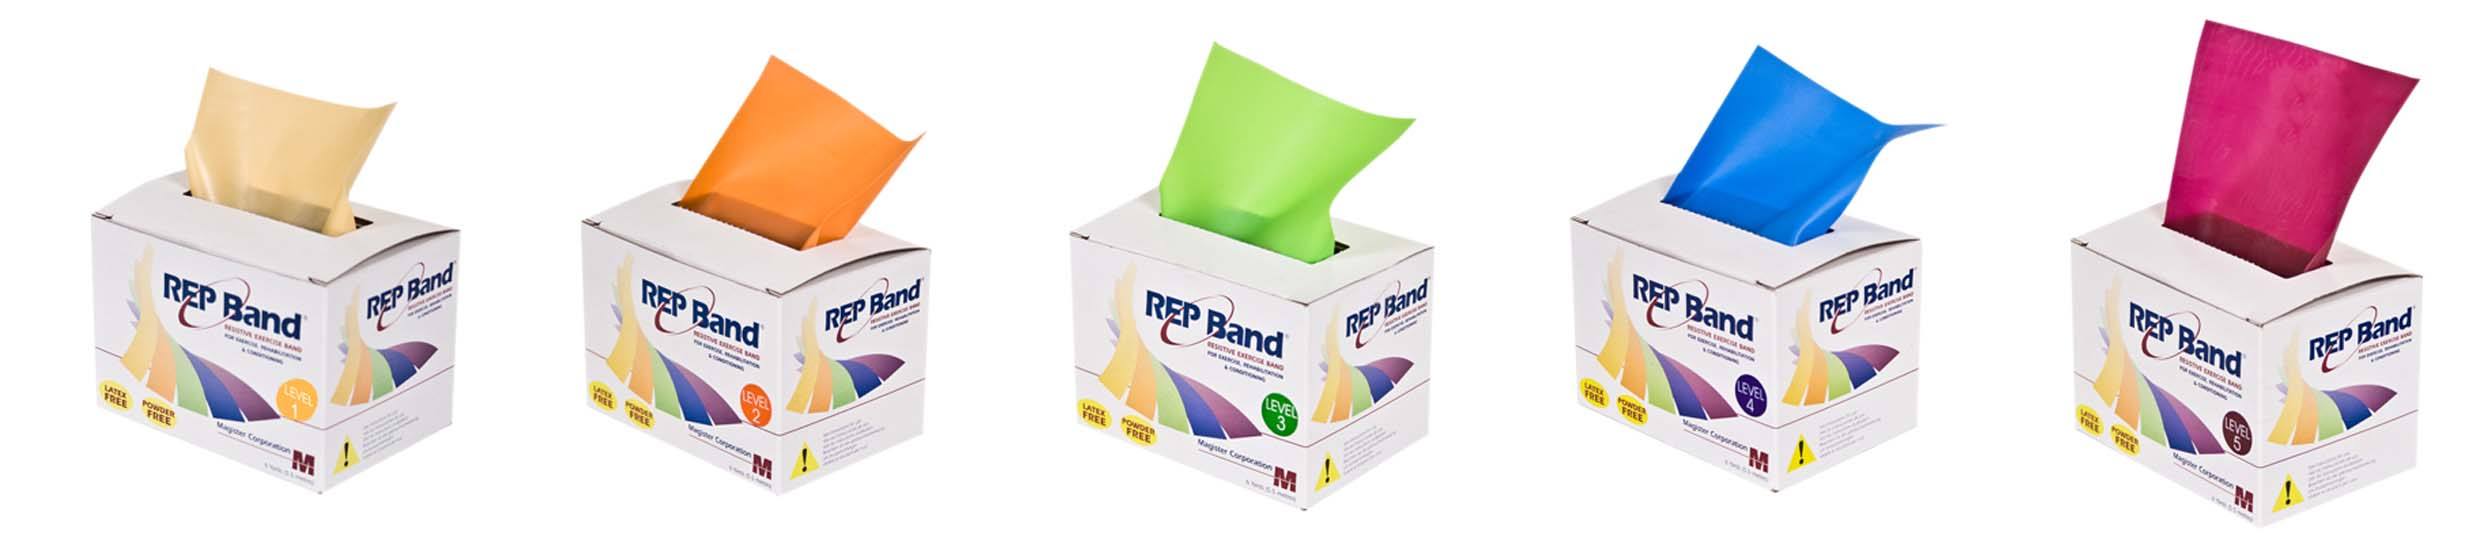 Rep Band 1 2 3 4 5 Banner